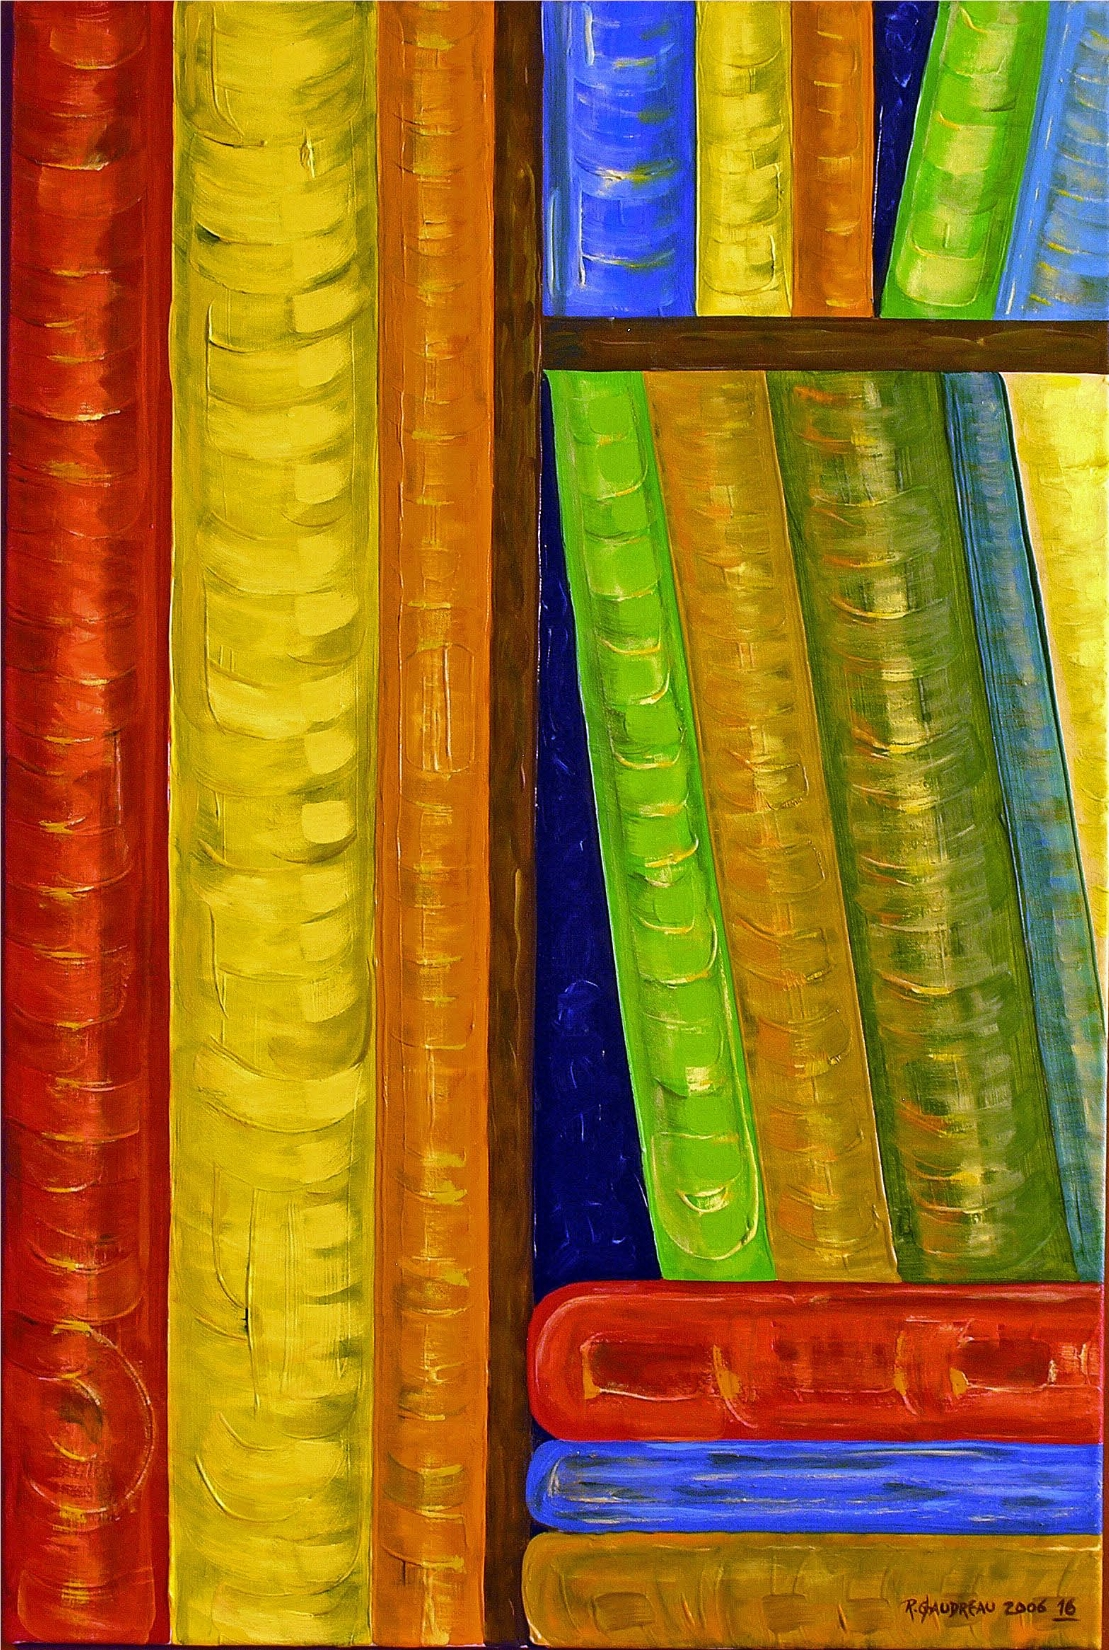 1250 16 Books Max pxl MasterJPG.jpg